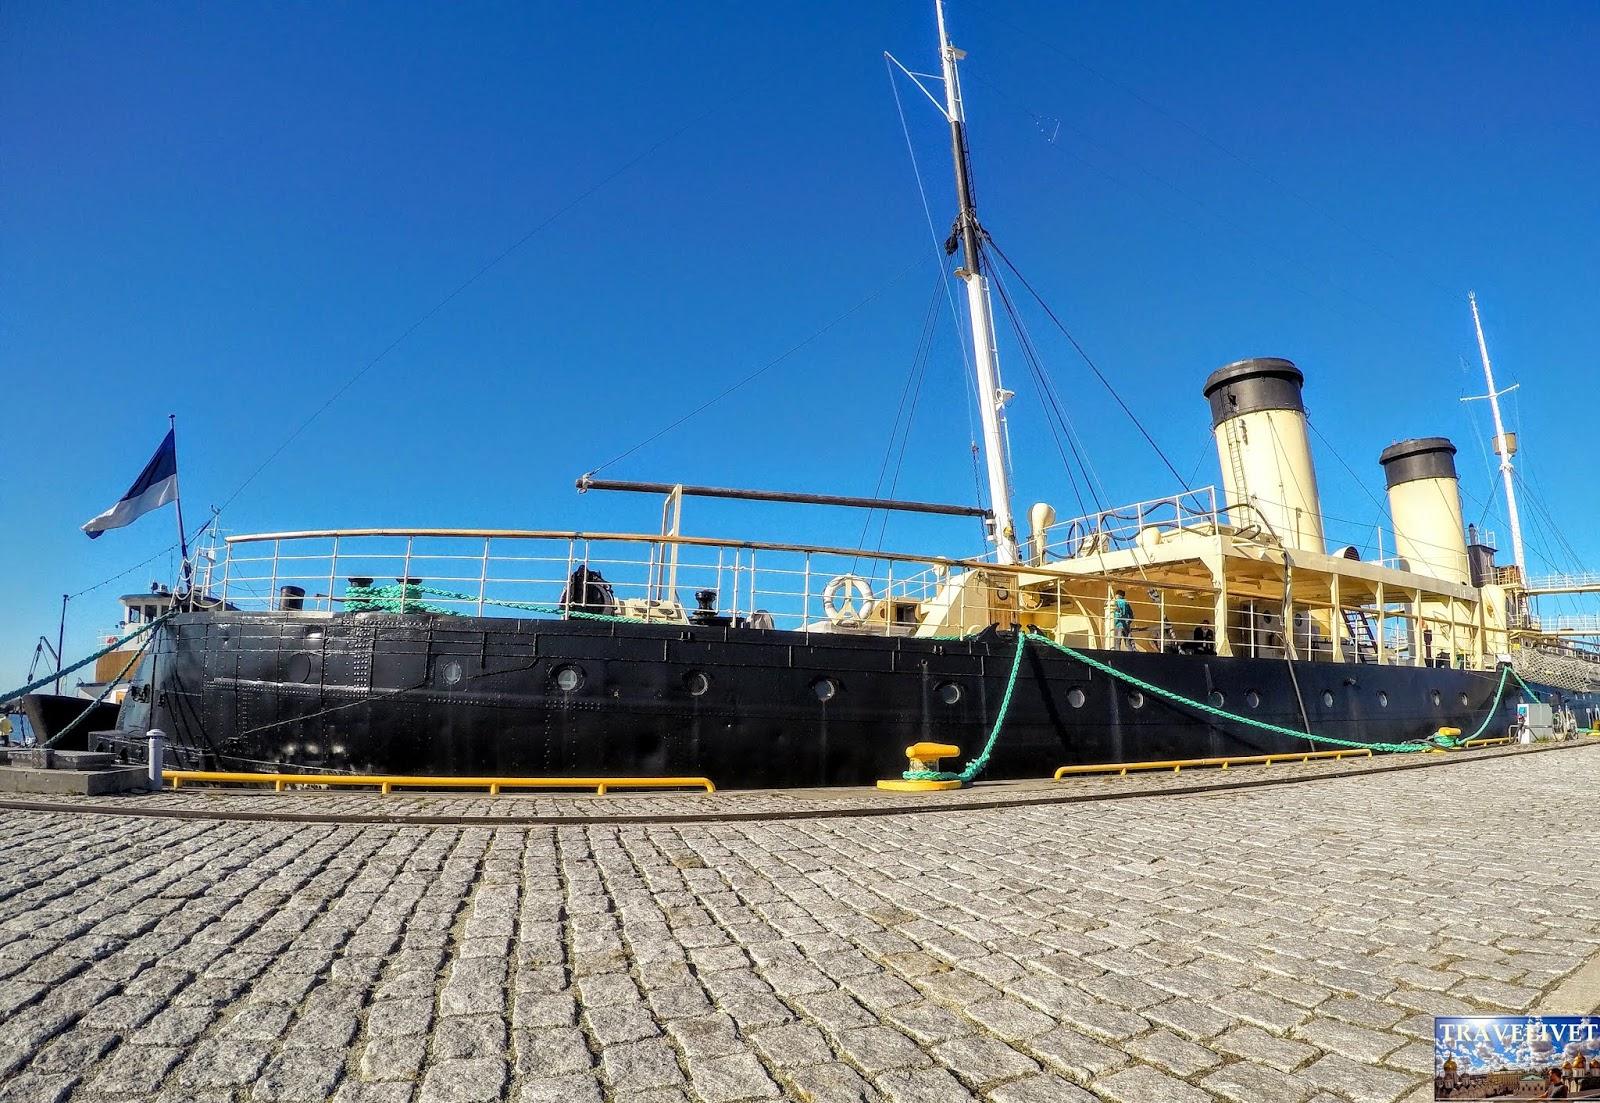 Estonie Tallinn Seaplane Harbour Lennusadam